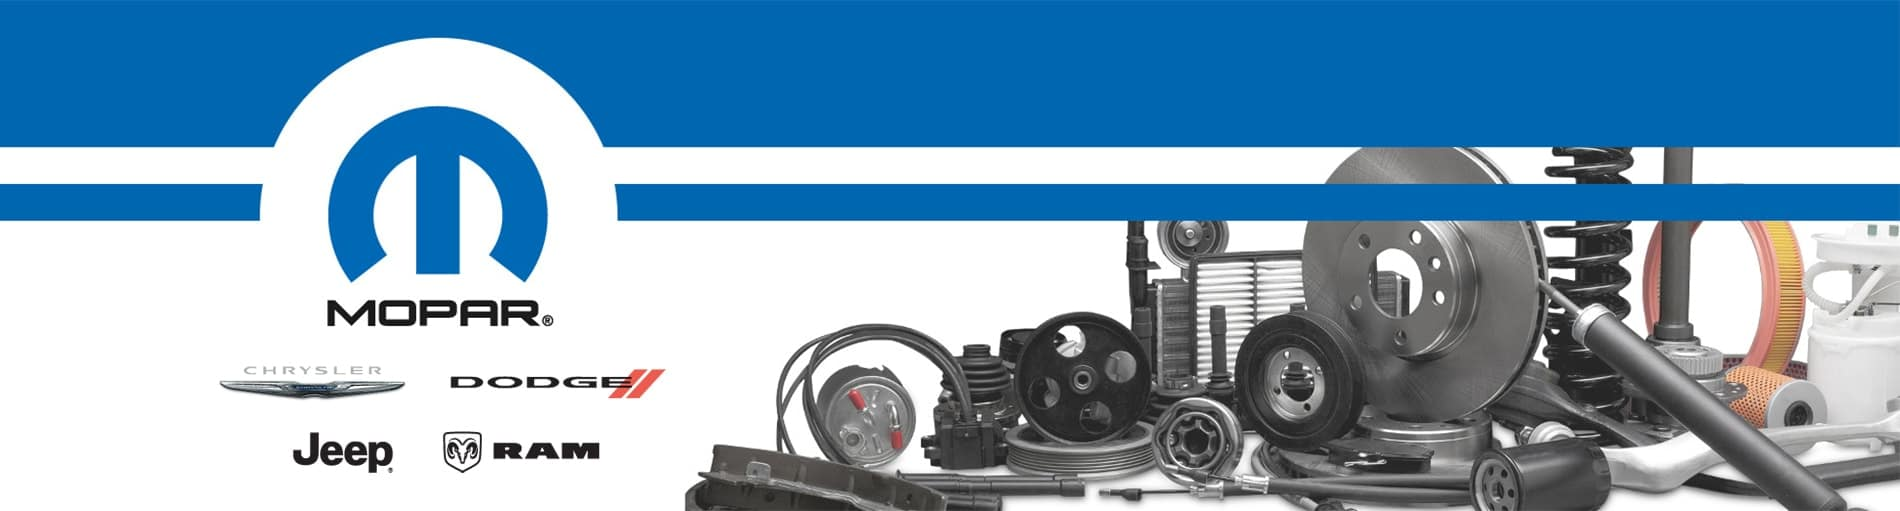 Twin Lakes - Mopar Parts - Jeep Parts - CDJR